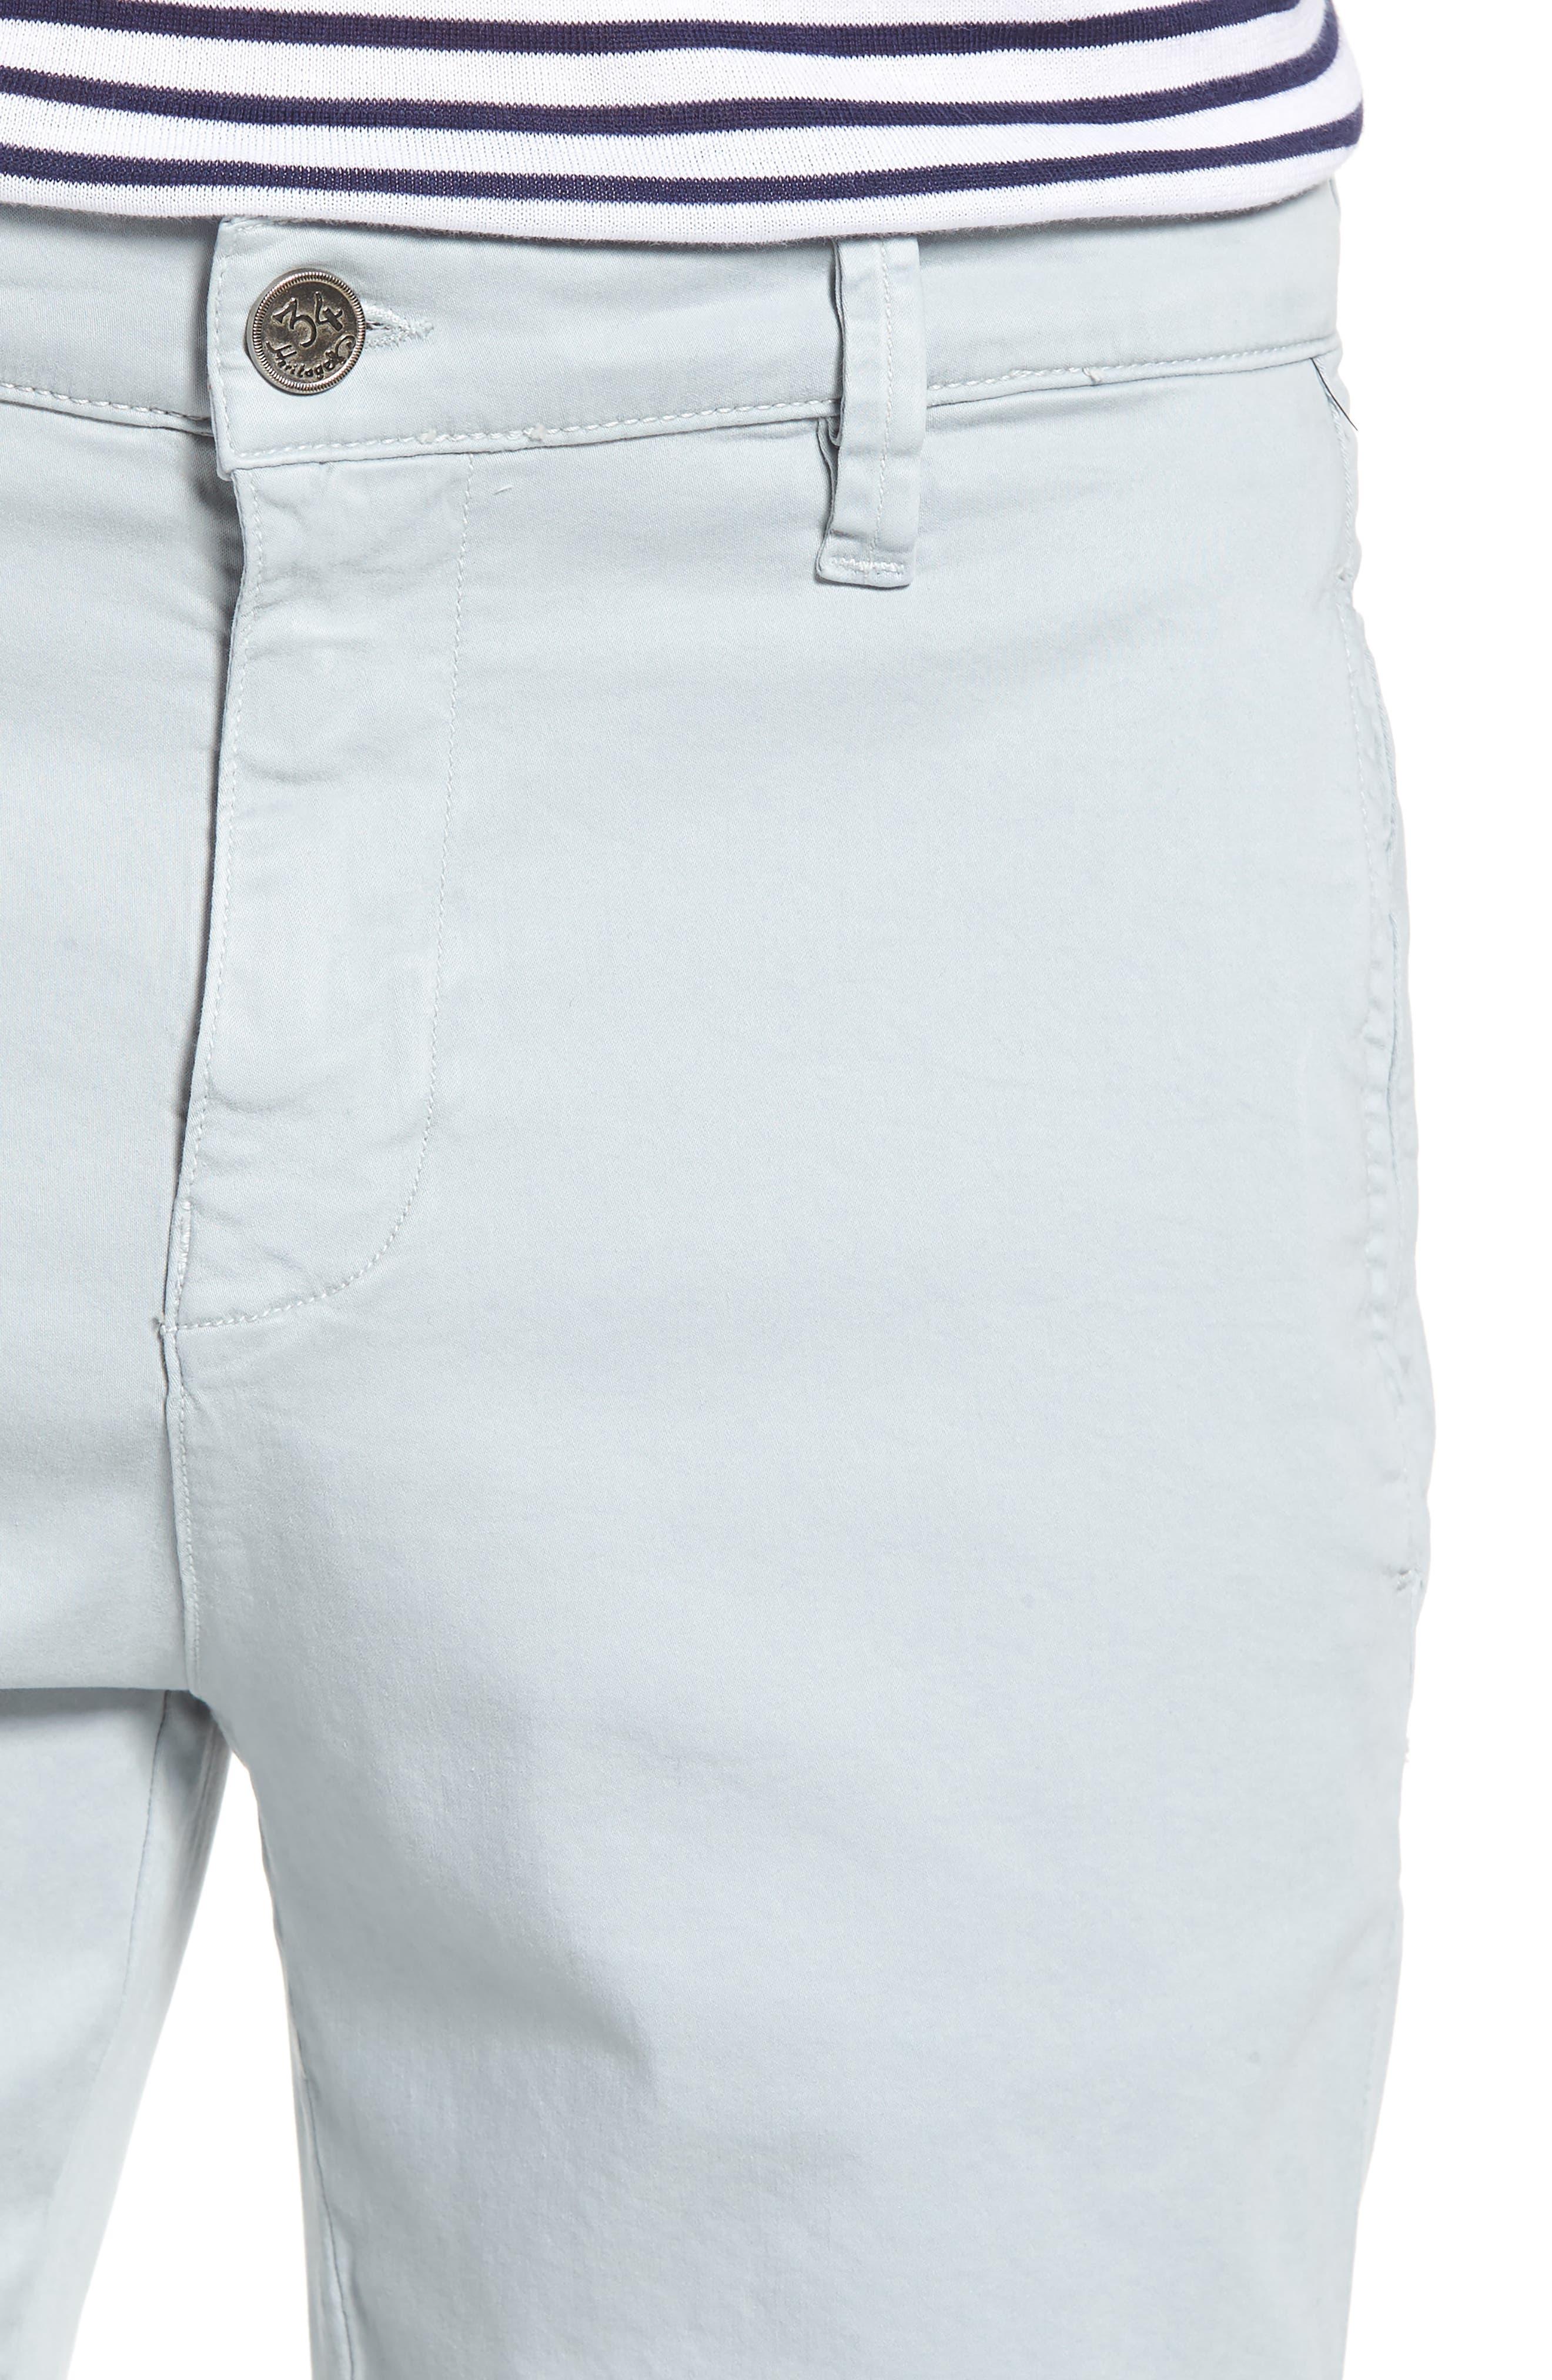 Nevada Twill Shorts,                             Alternate thumbnail 4, color,                             ICE TWILL